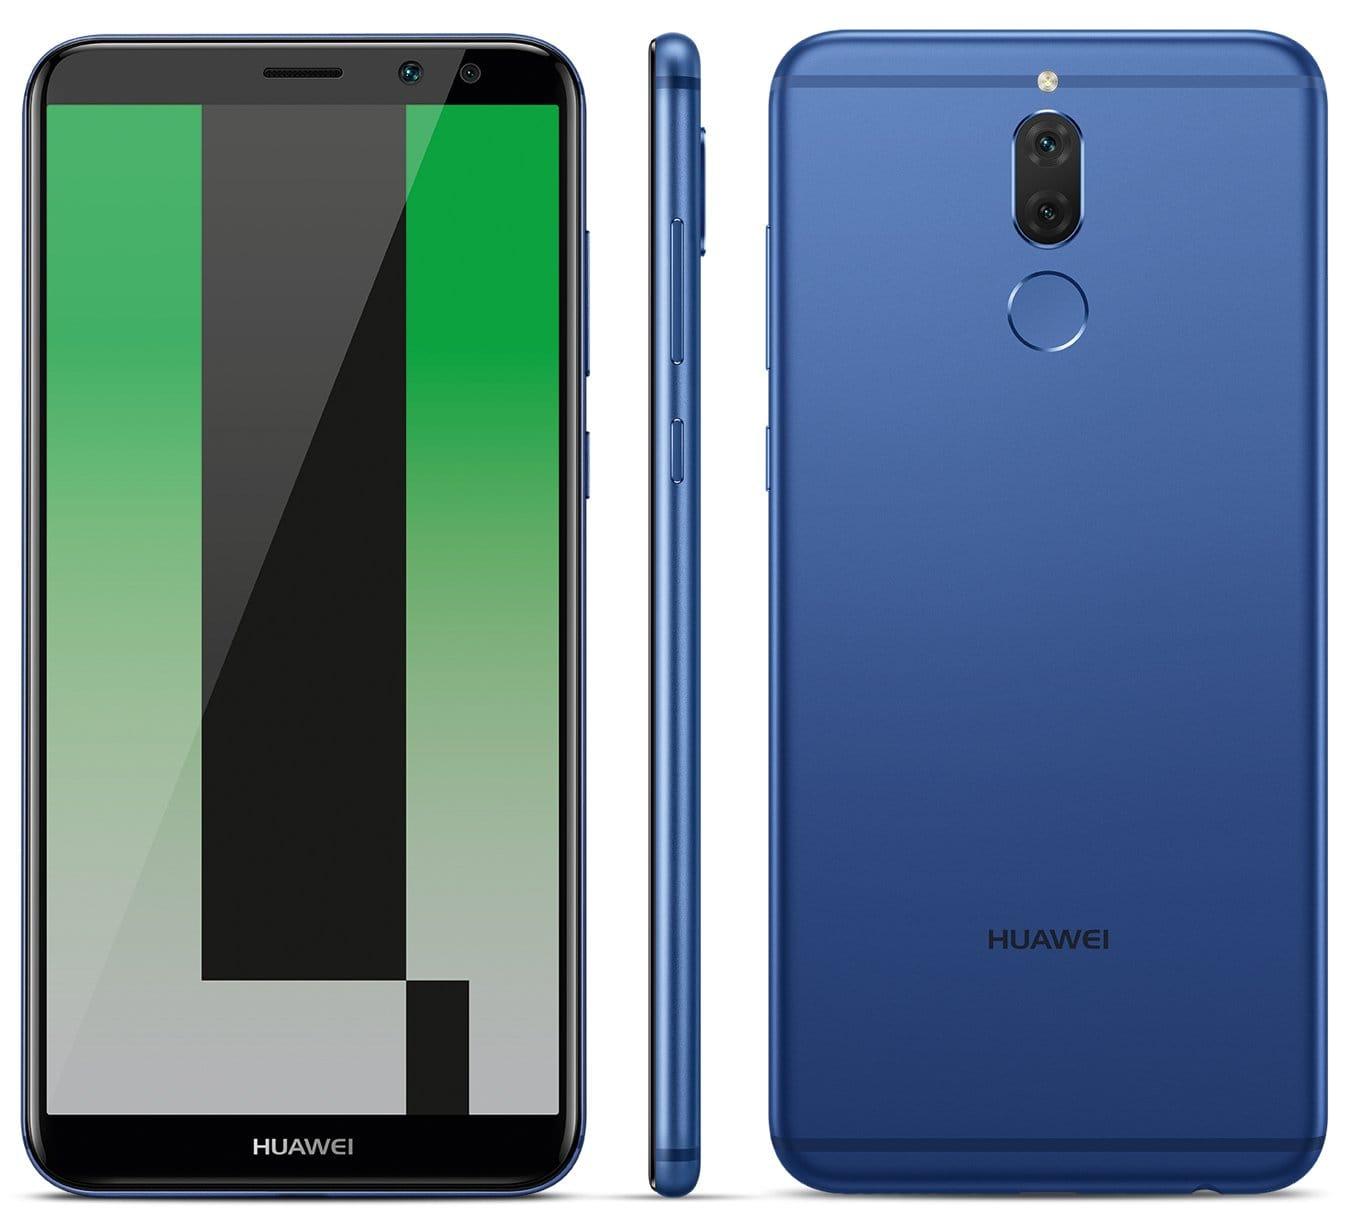 Huawei представил флагманские мобильные телефоны  Mate 10 иMate 10 Pro